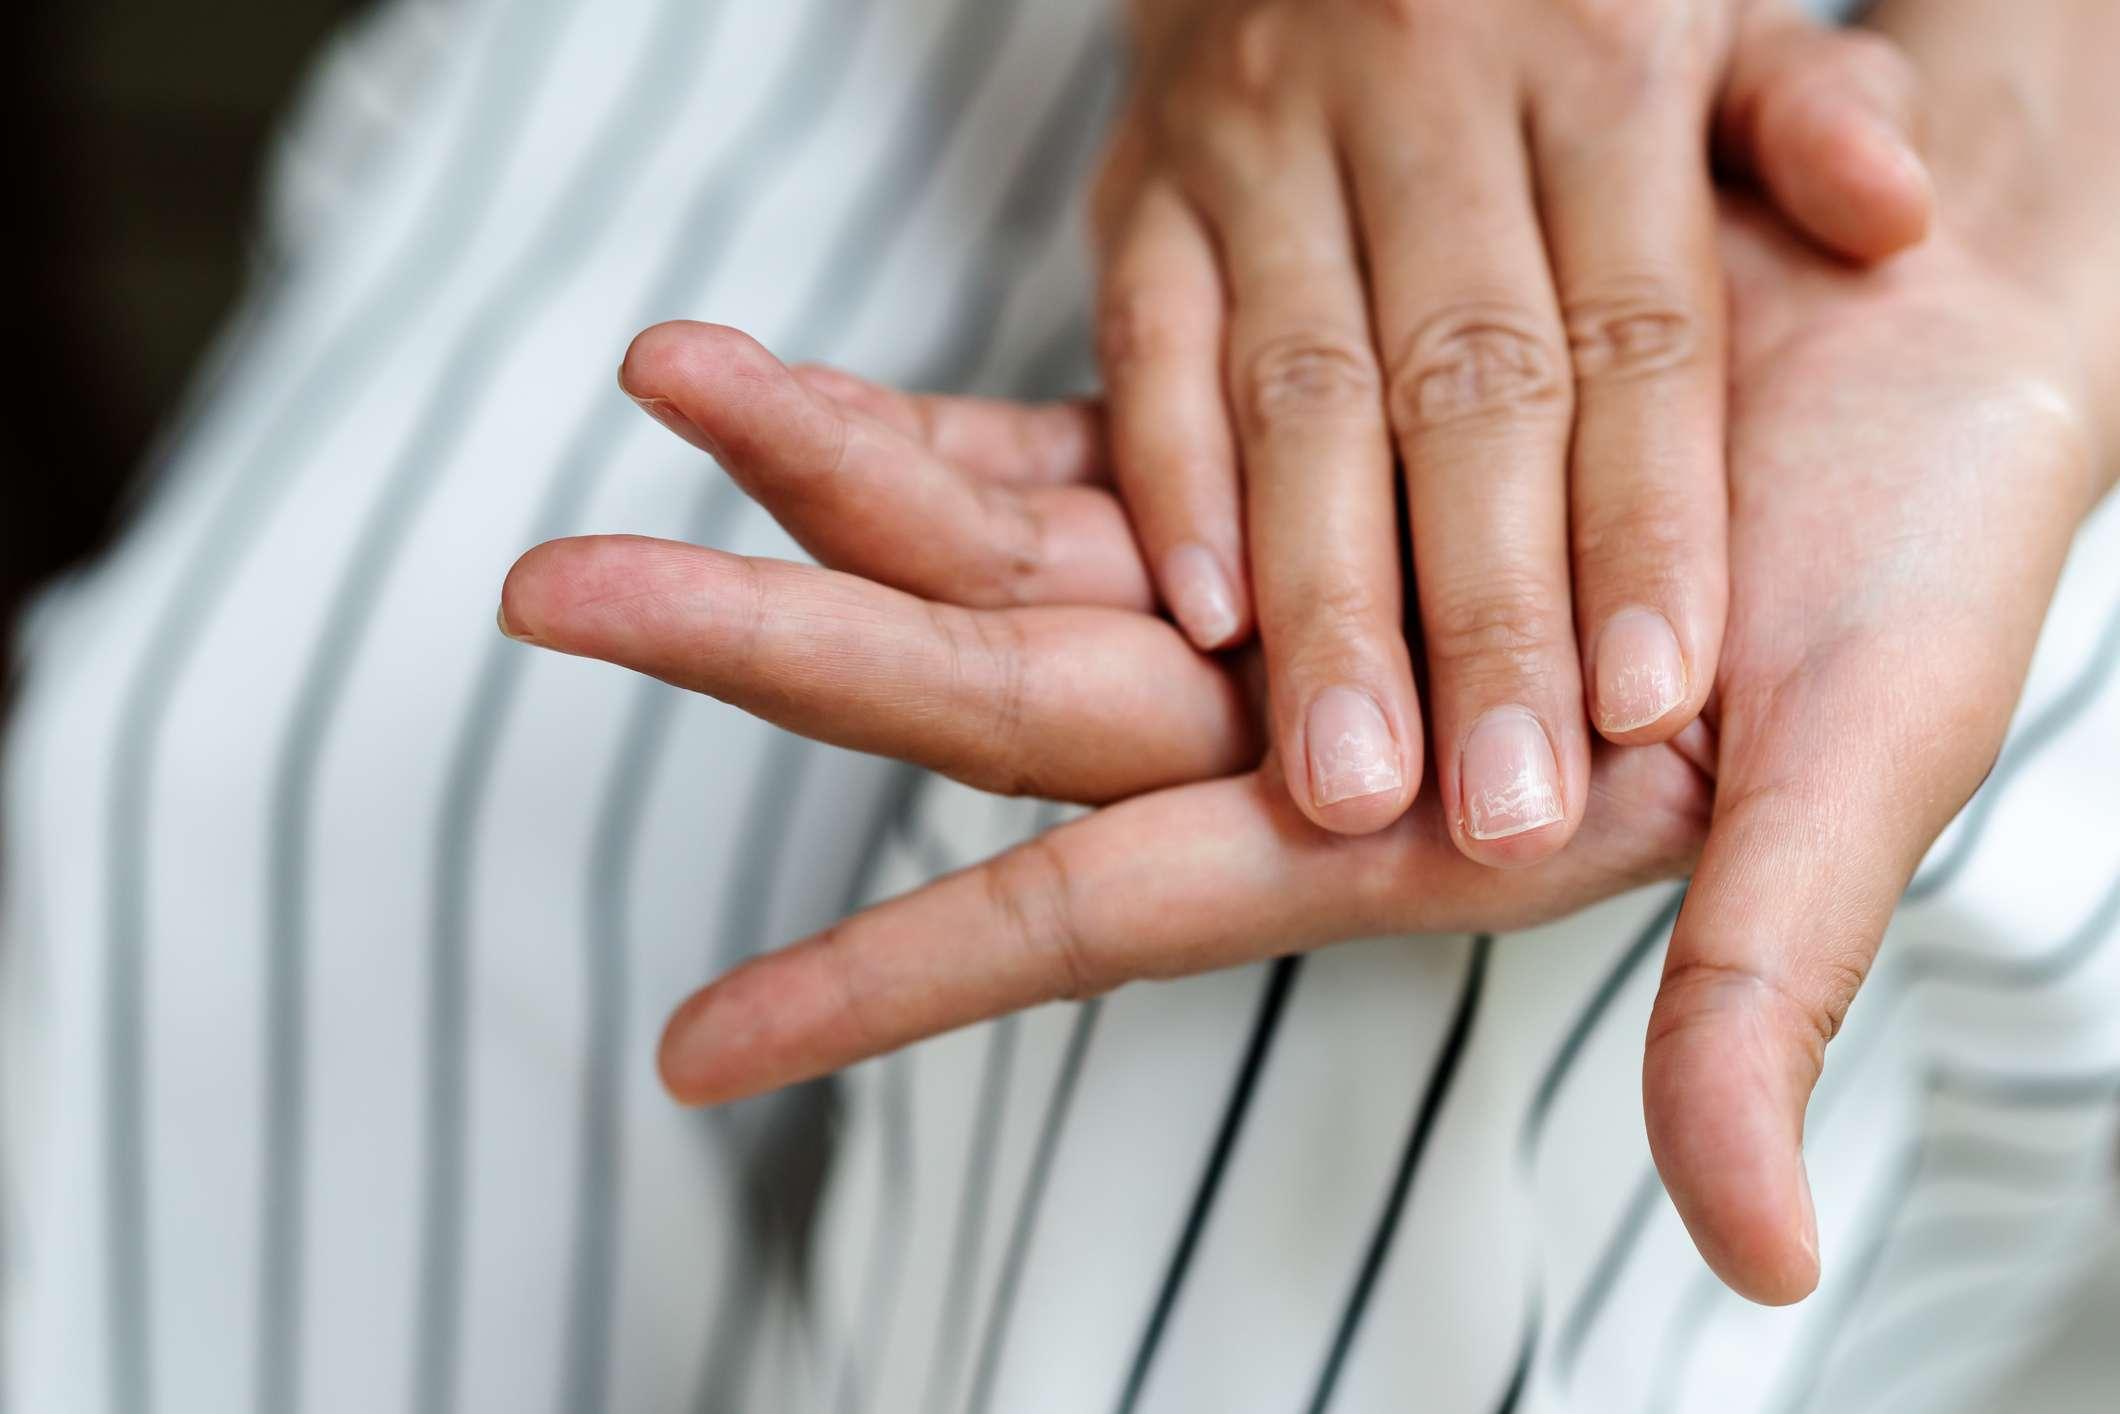 Brittle, damaged nails